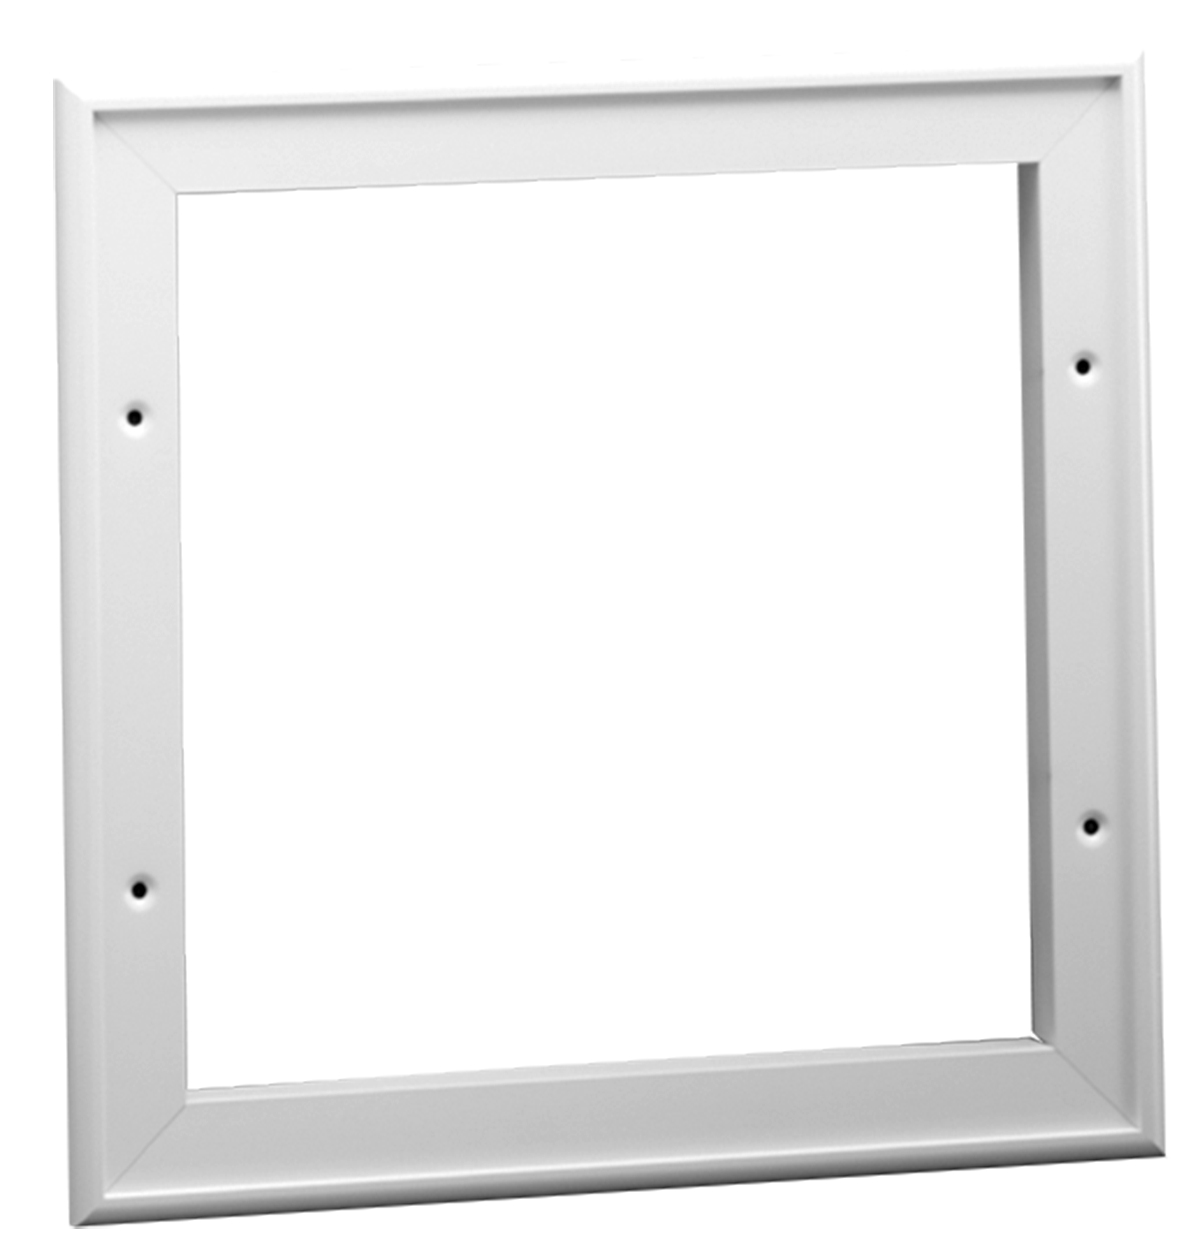 APF - Aluminum Plaster Frame | Hart & Cooley